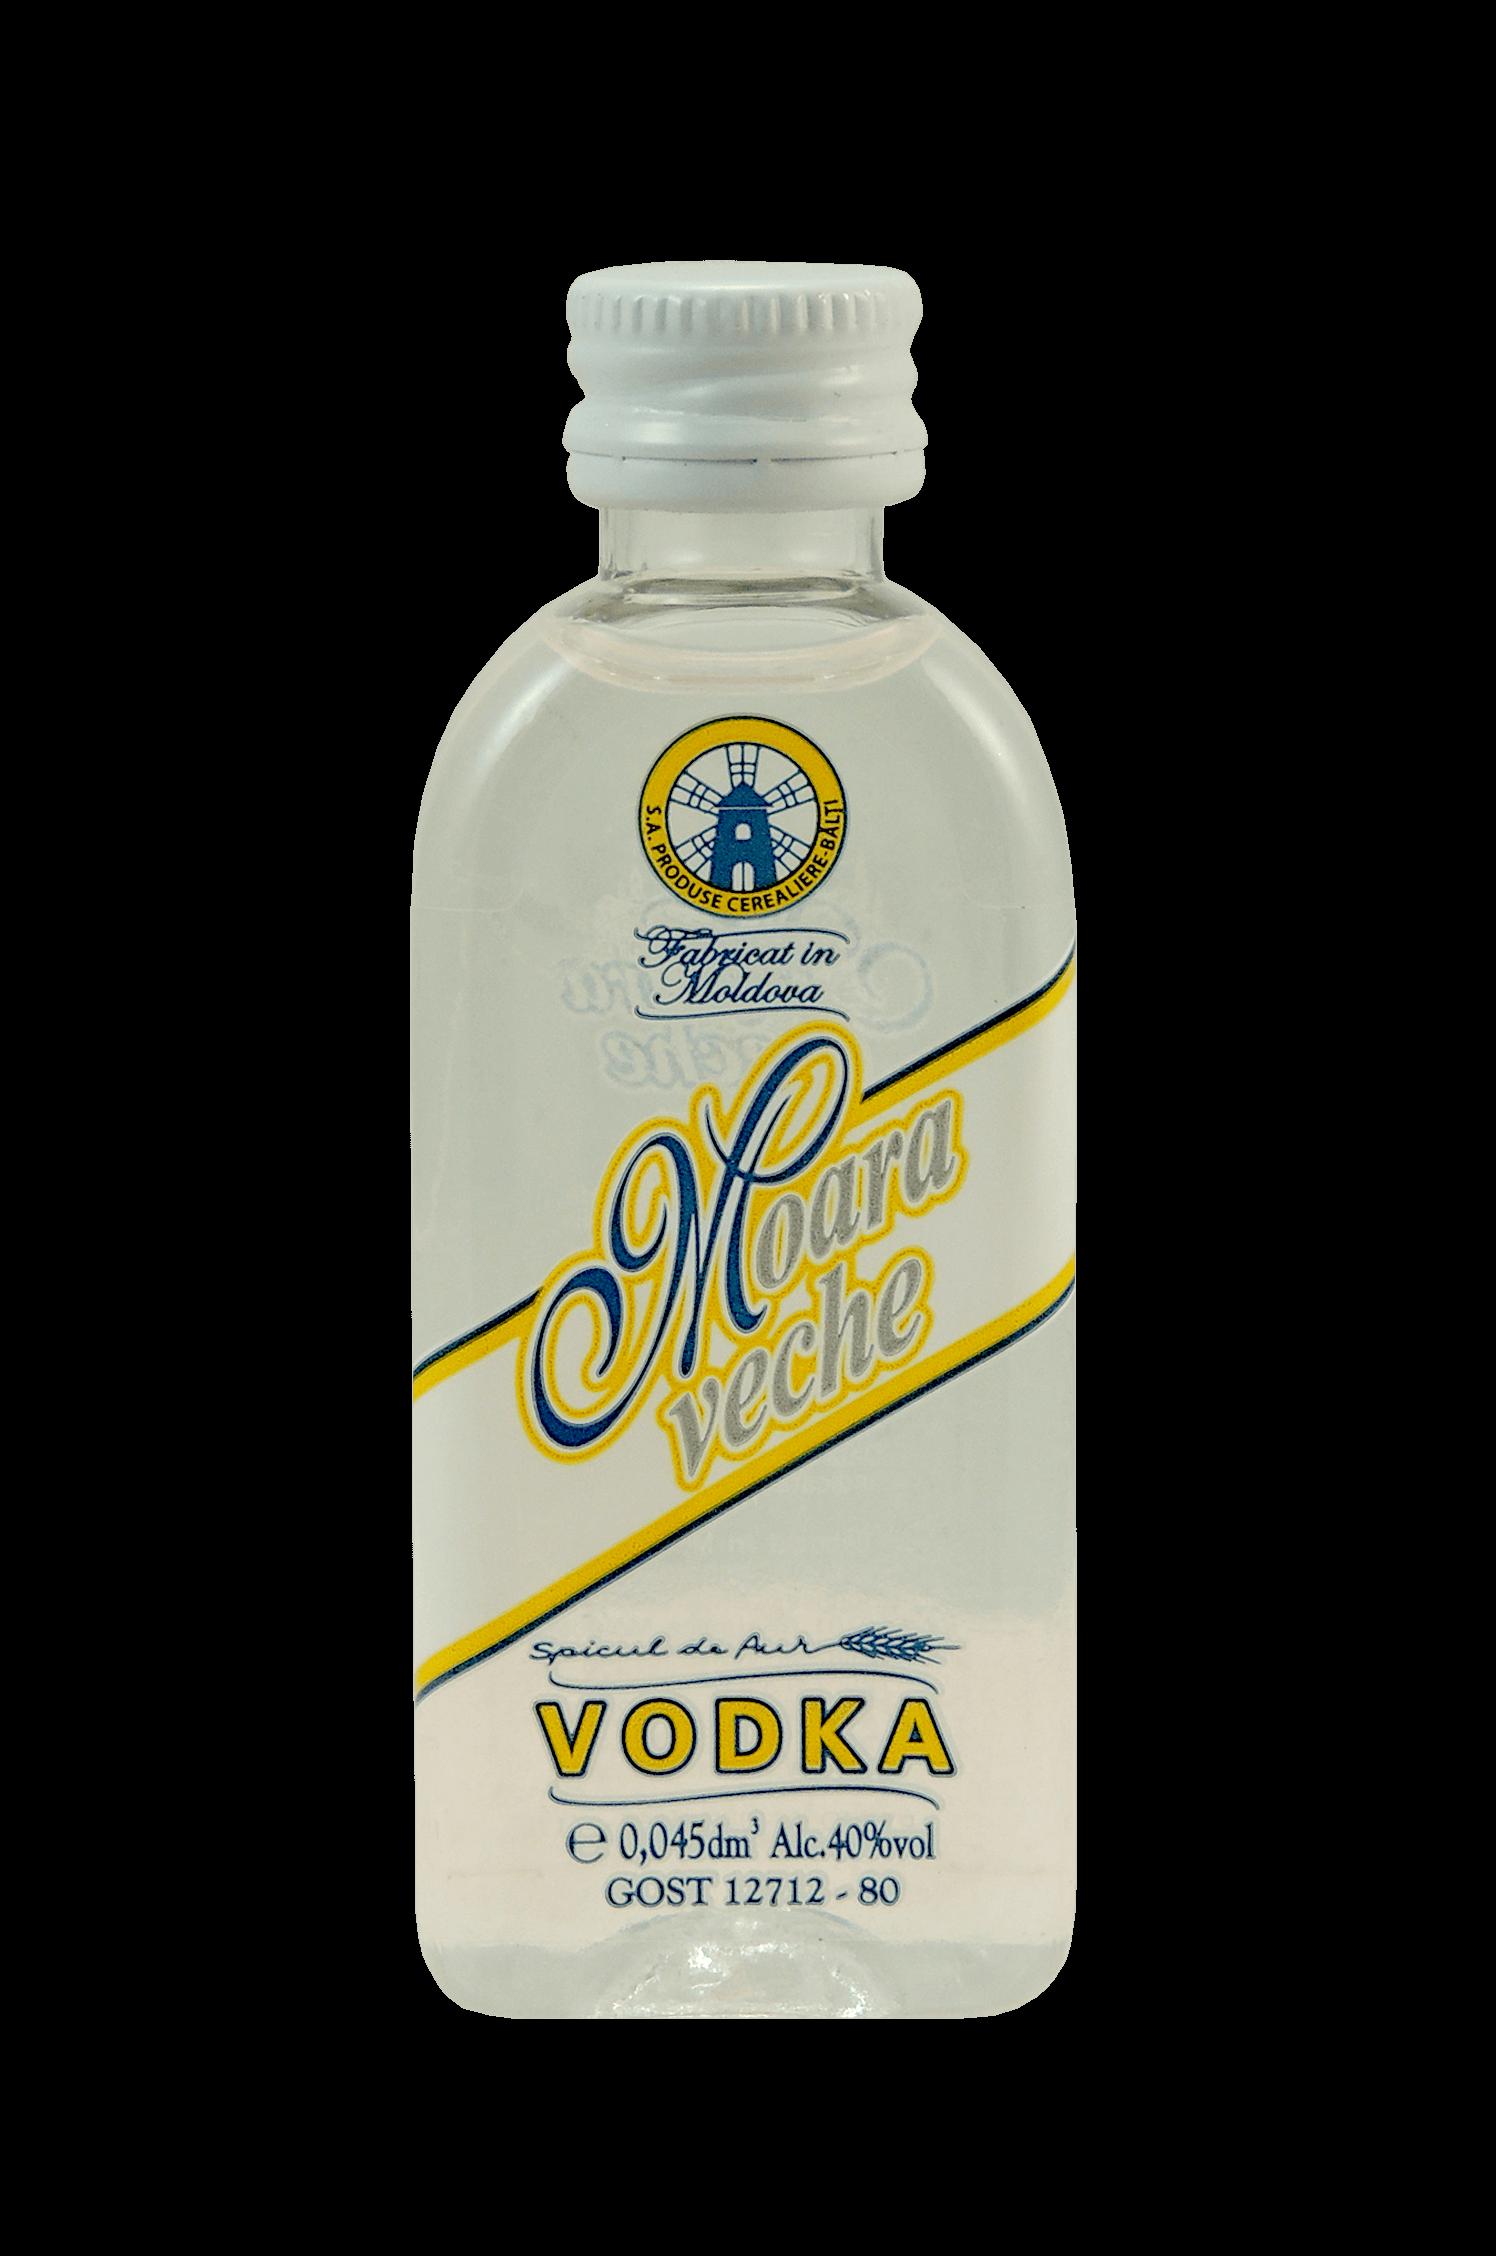 Moara Veche Vodka